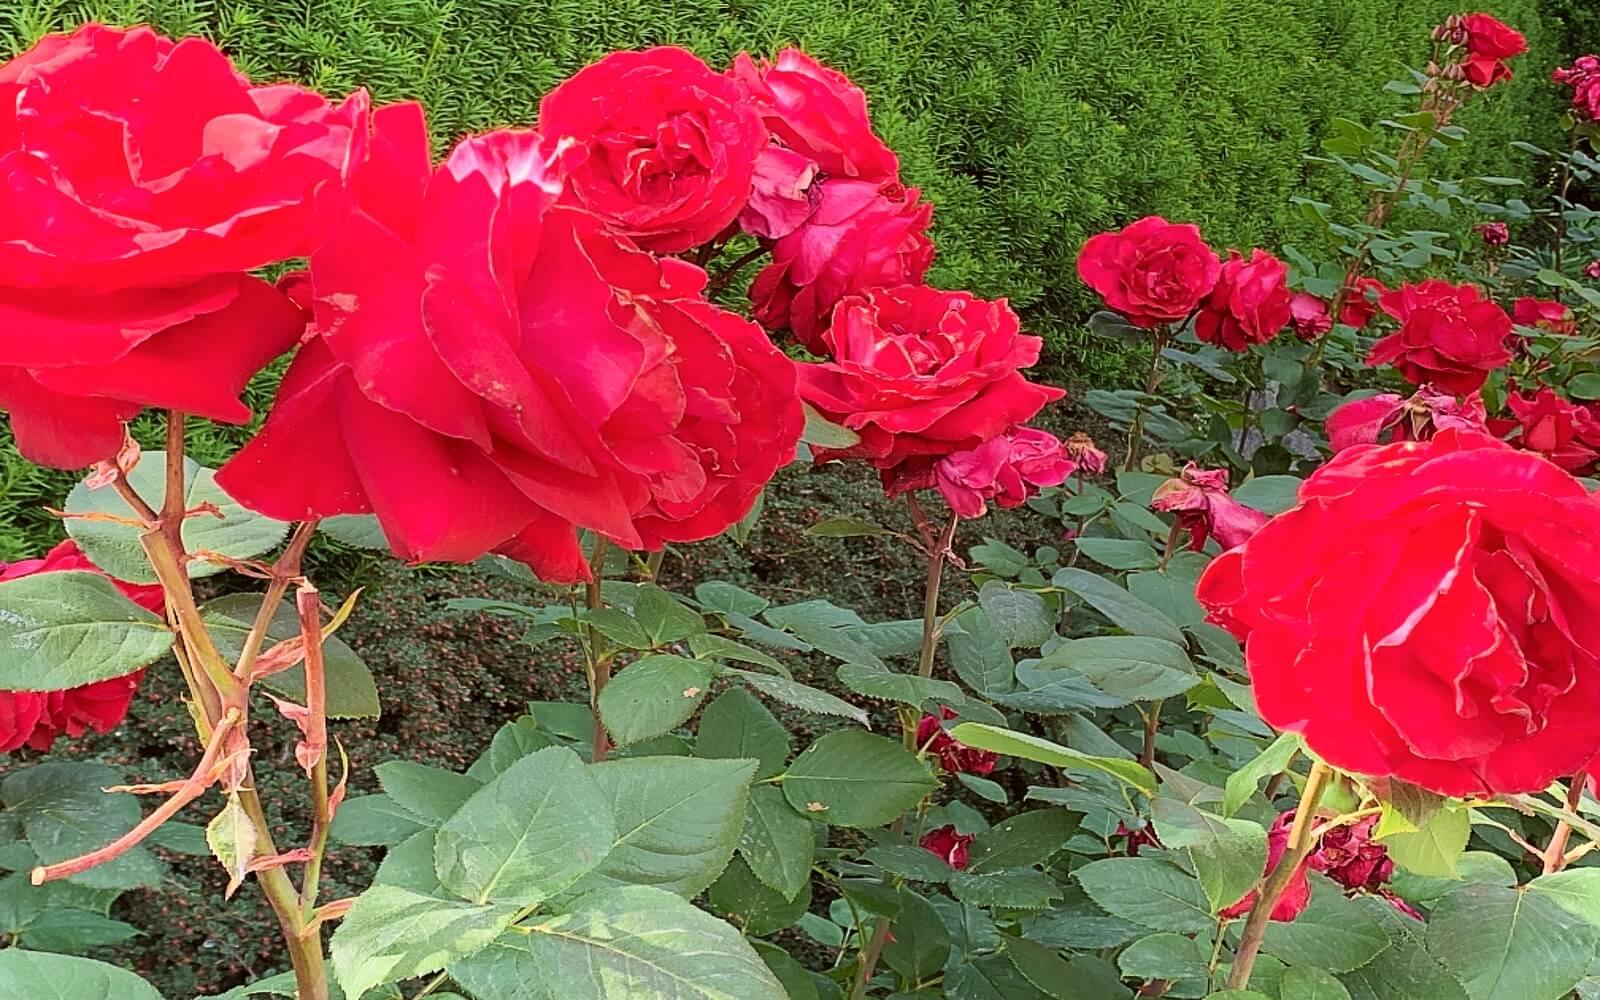 Large red roses at Van Dusen Garden